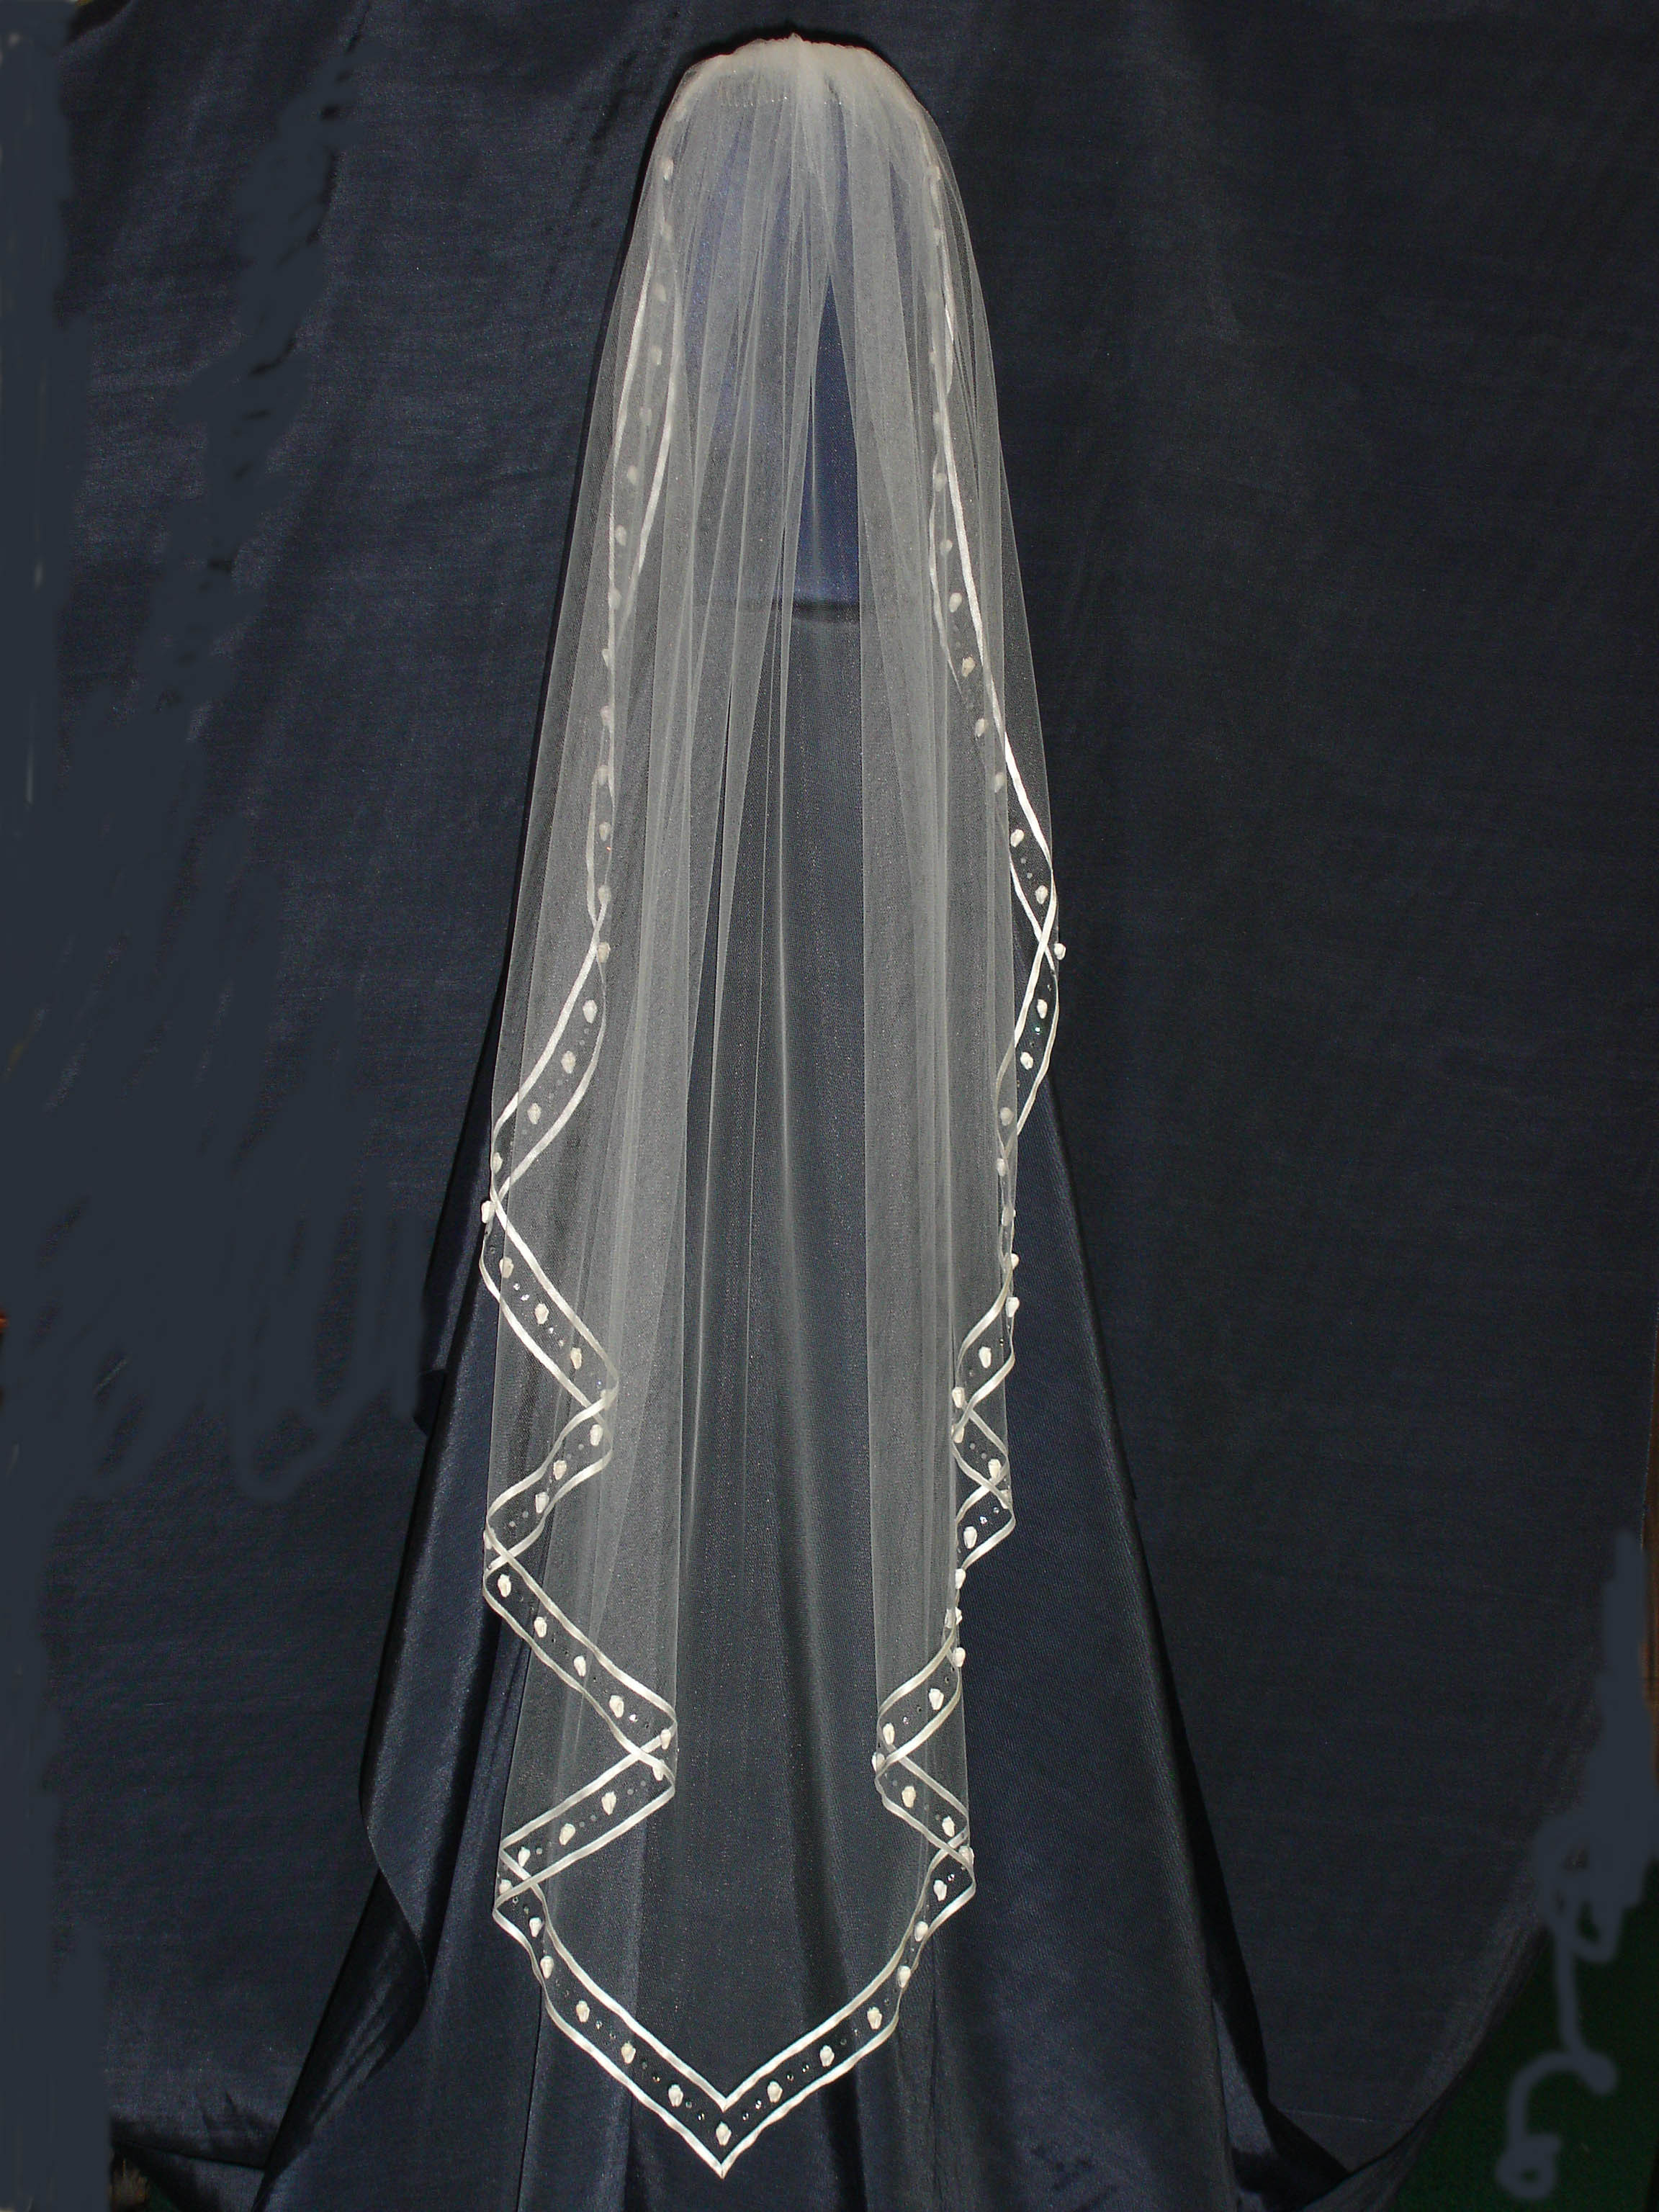 llc, Artistic veil design studio